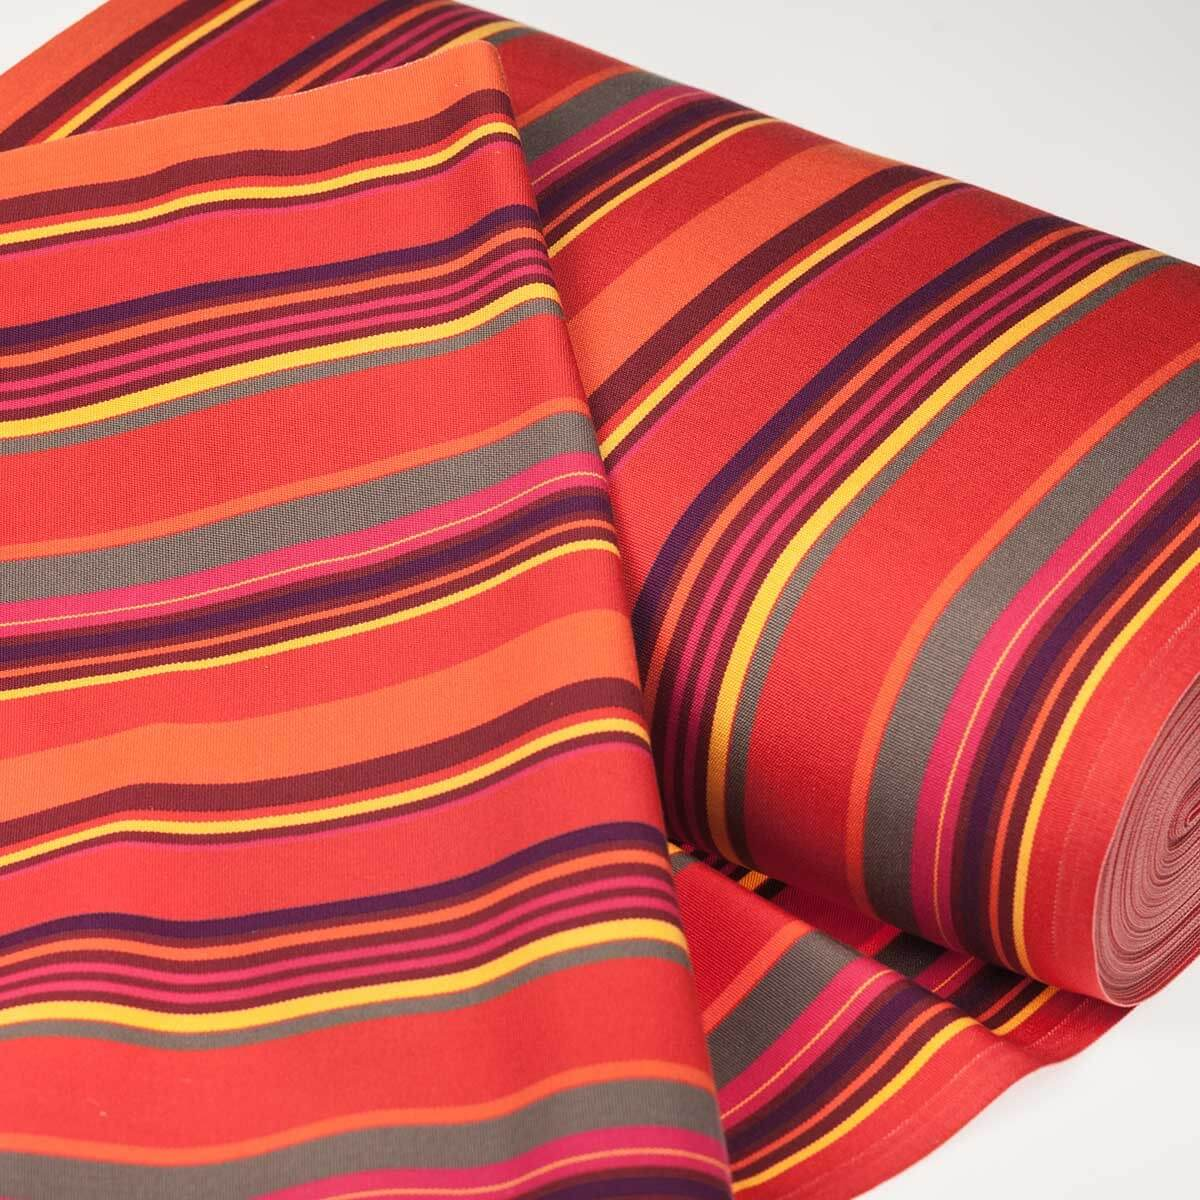 toile transat outdoor hossegor 150cm x 43cm multicolore mercerie car fil. Black Bedroom Furniture Sets. Home Design Ideas